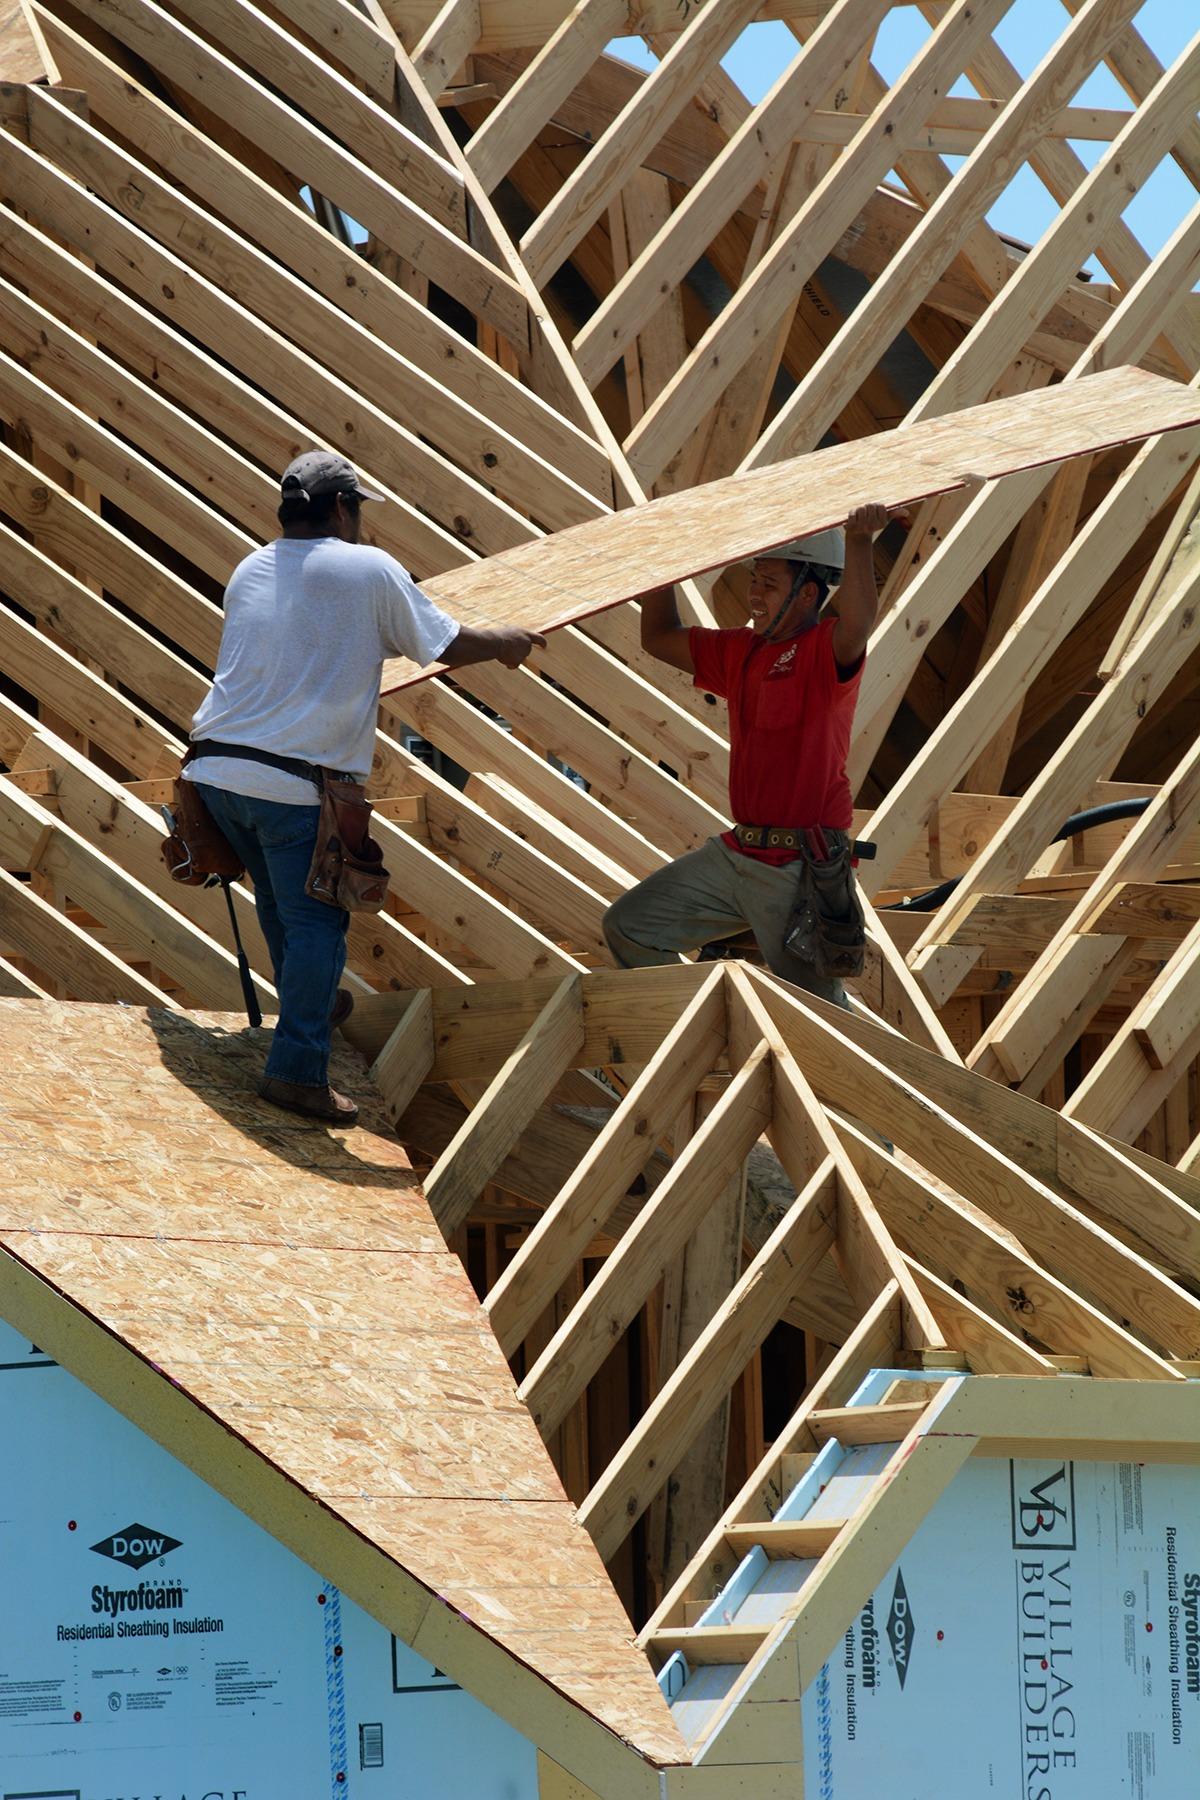 building boom limits affordable housing options houston. Black Bedroom Furniture Sets. Home Design Ideas